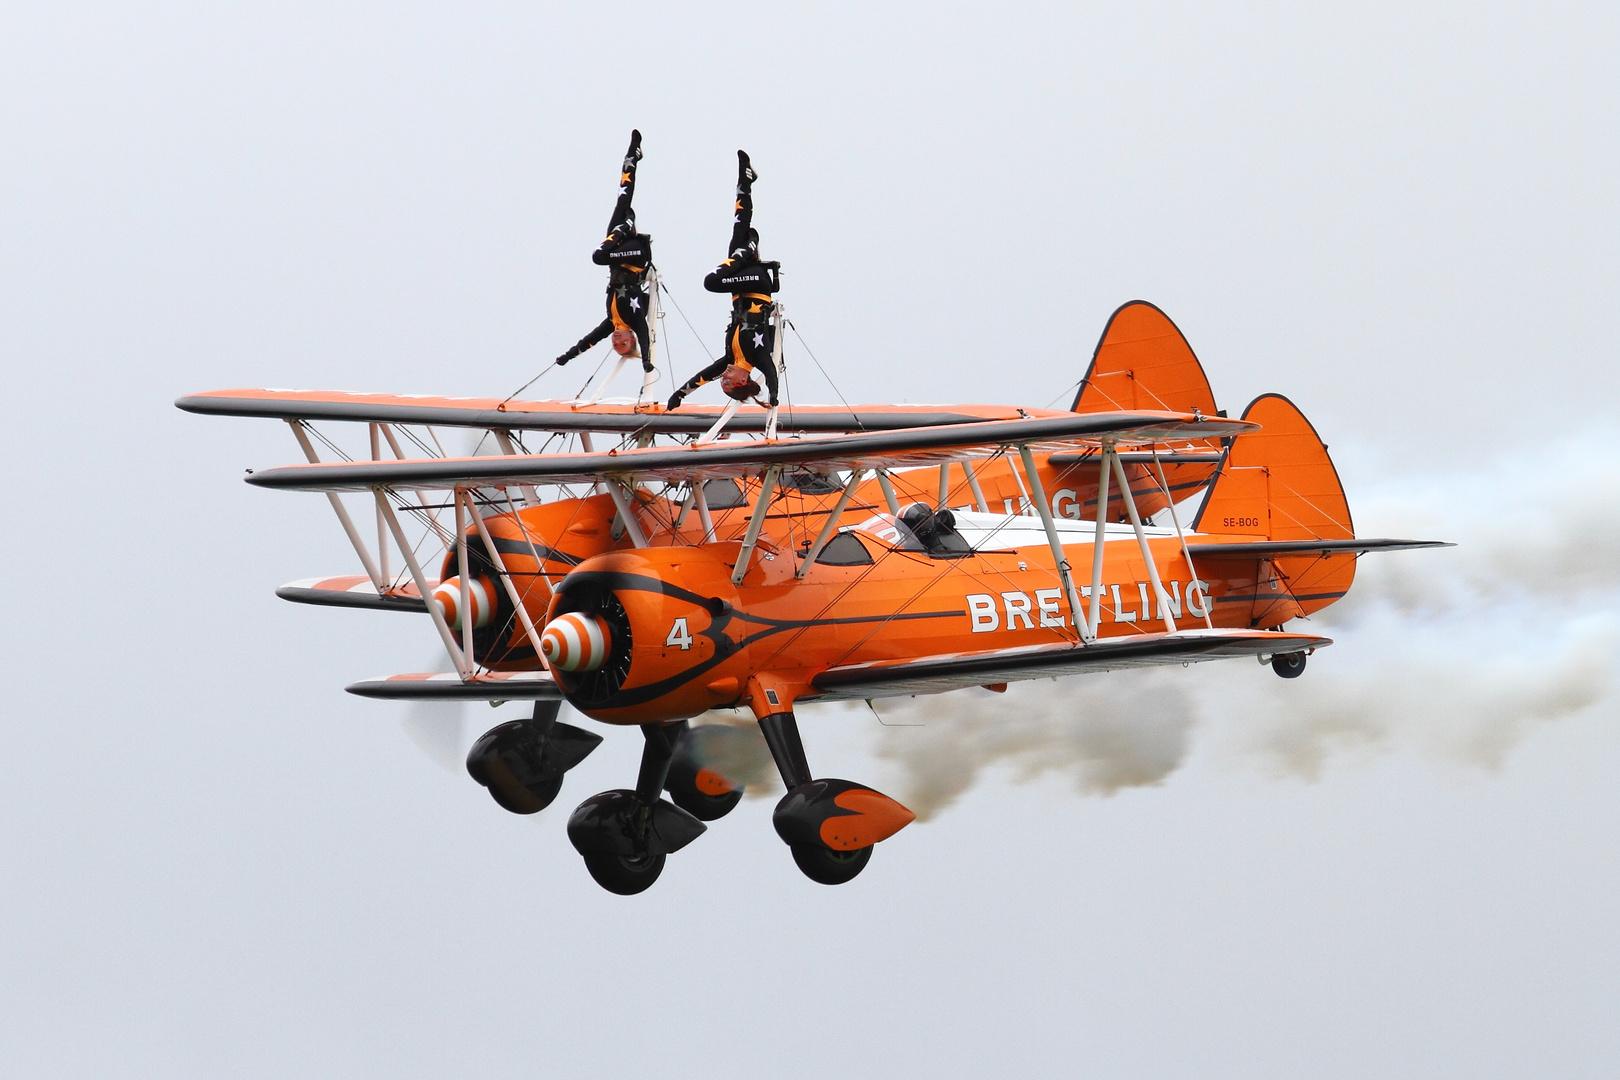 Oostwold Airshow 2013 #07